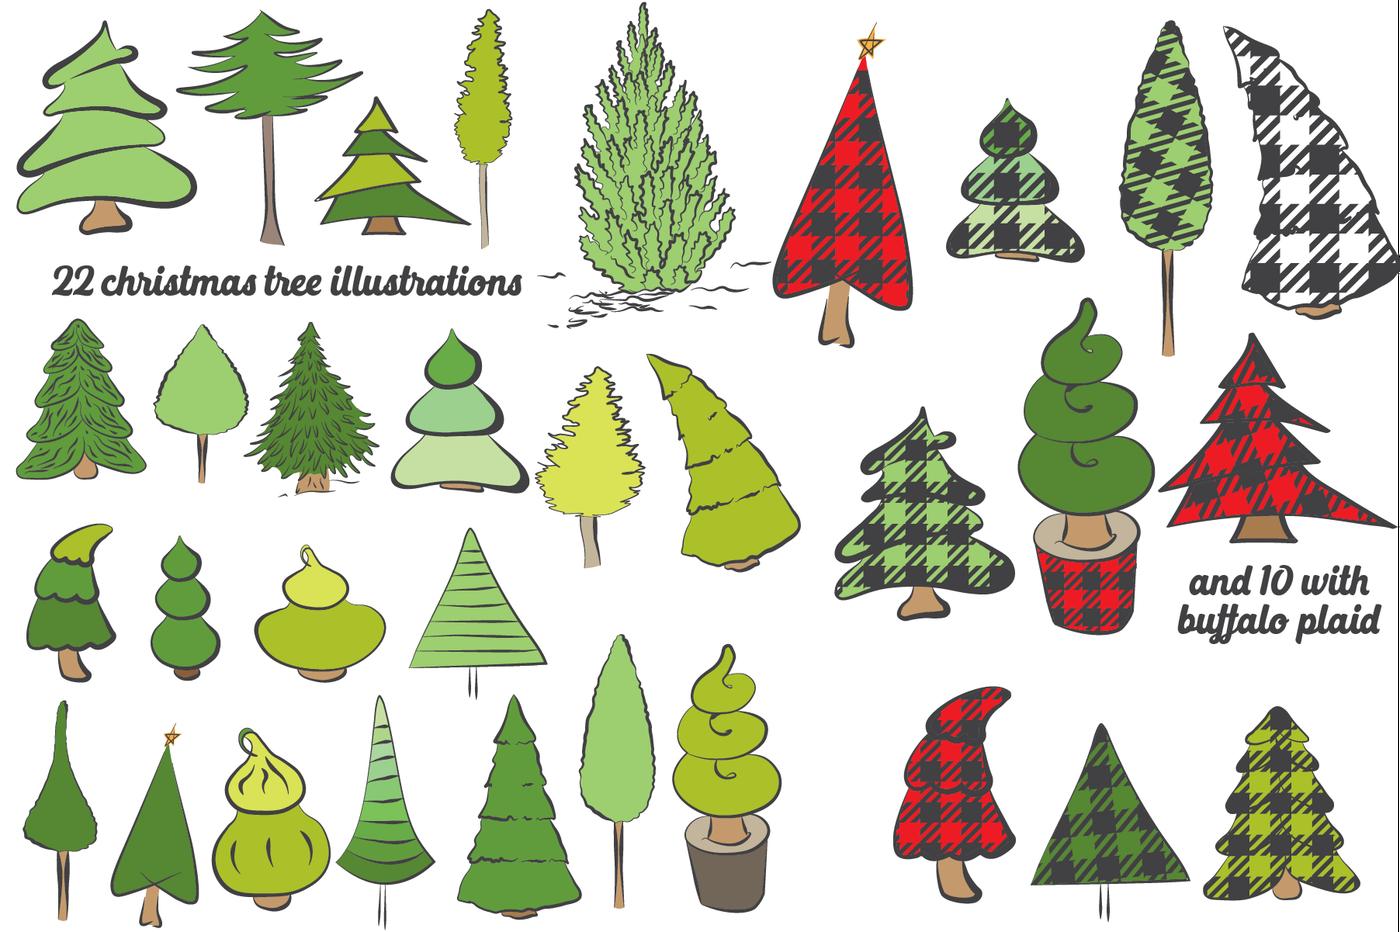 Buffalo Plaid Christmas Trees Vector Svg Eps By Dyrabyra